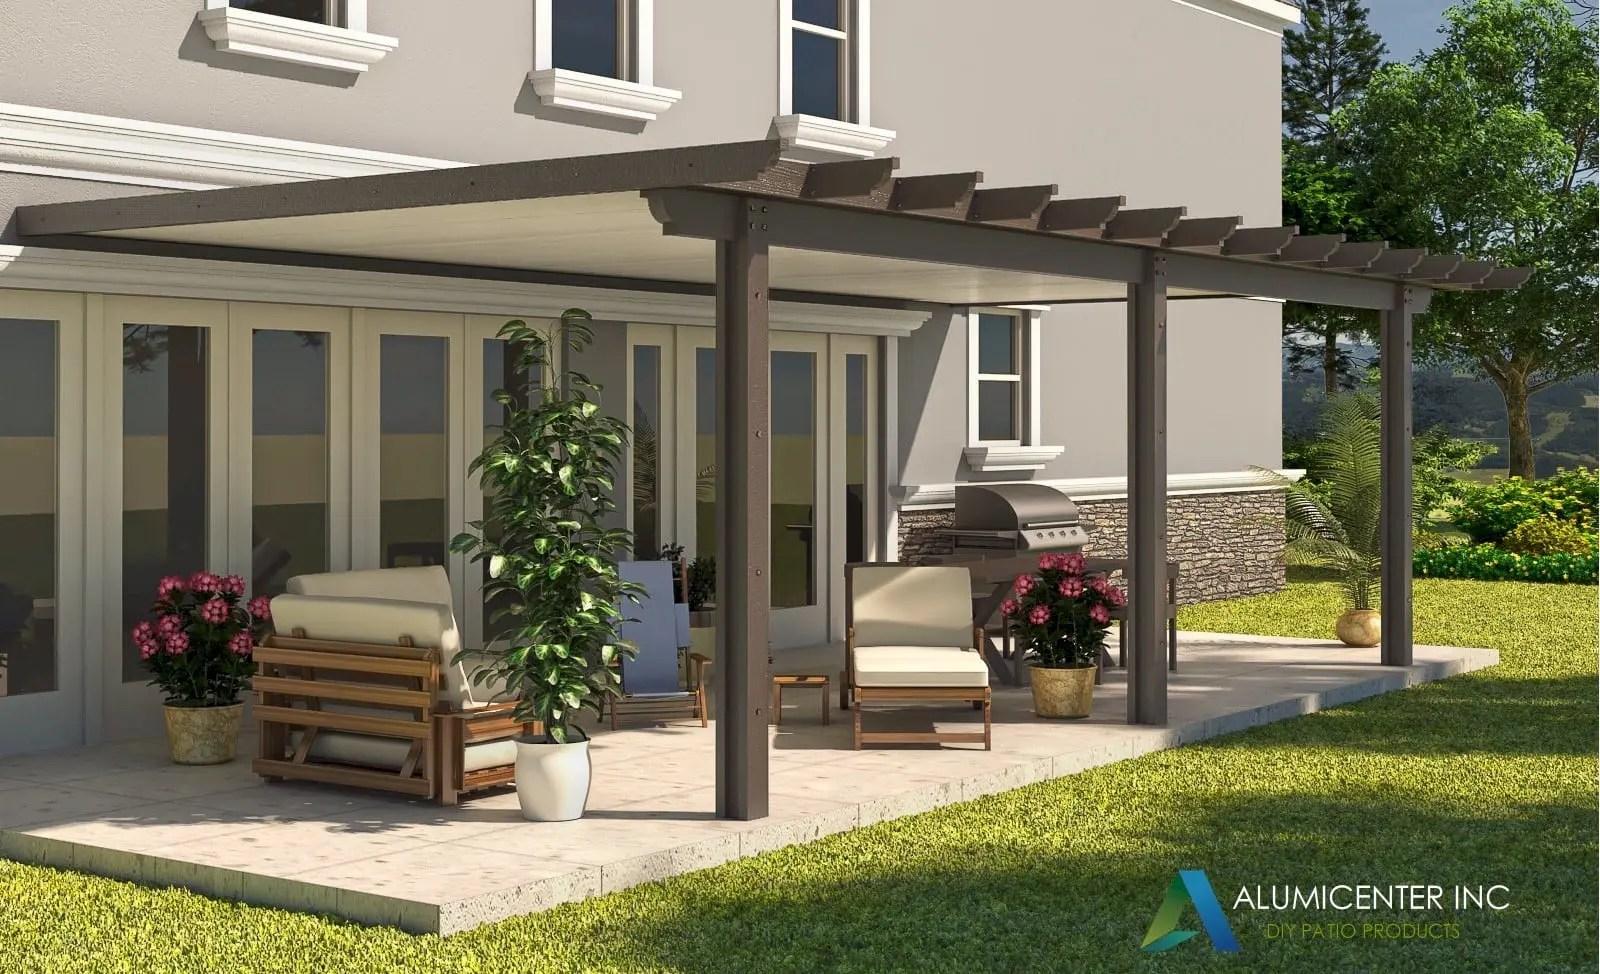 Trusted Builder Of Aluminum Patio Covers In Miami Dade Broward